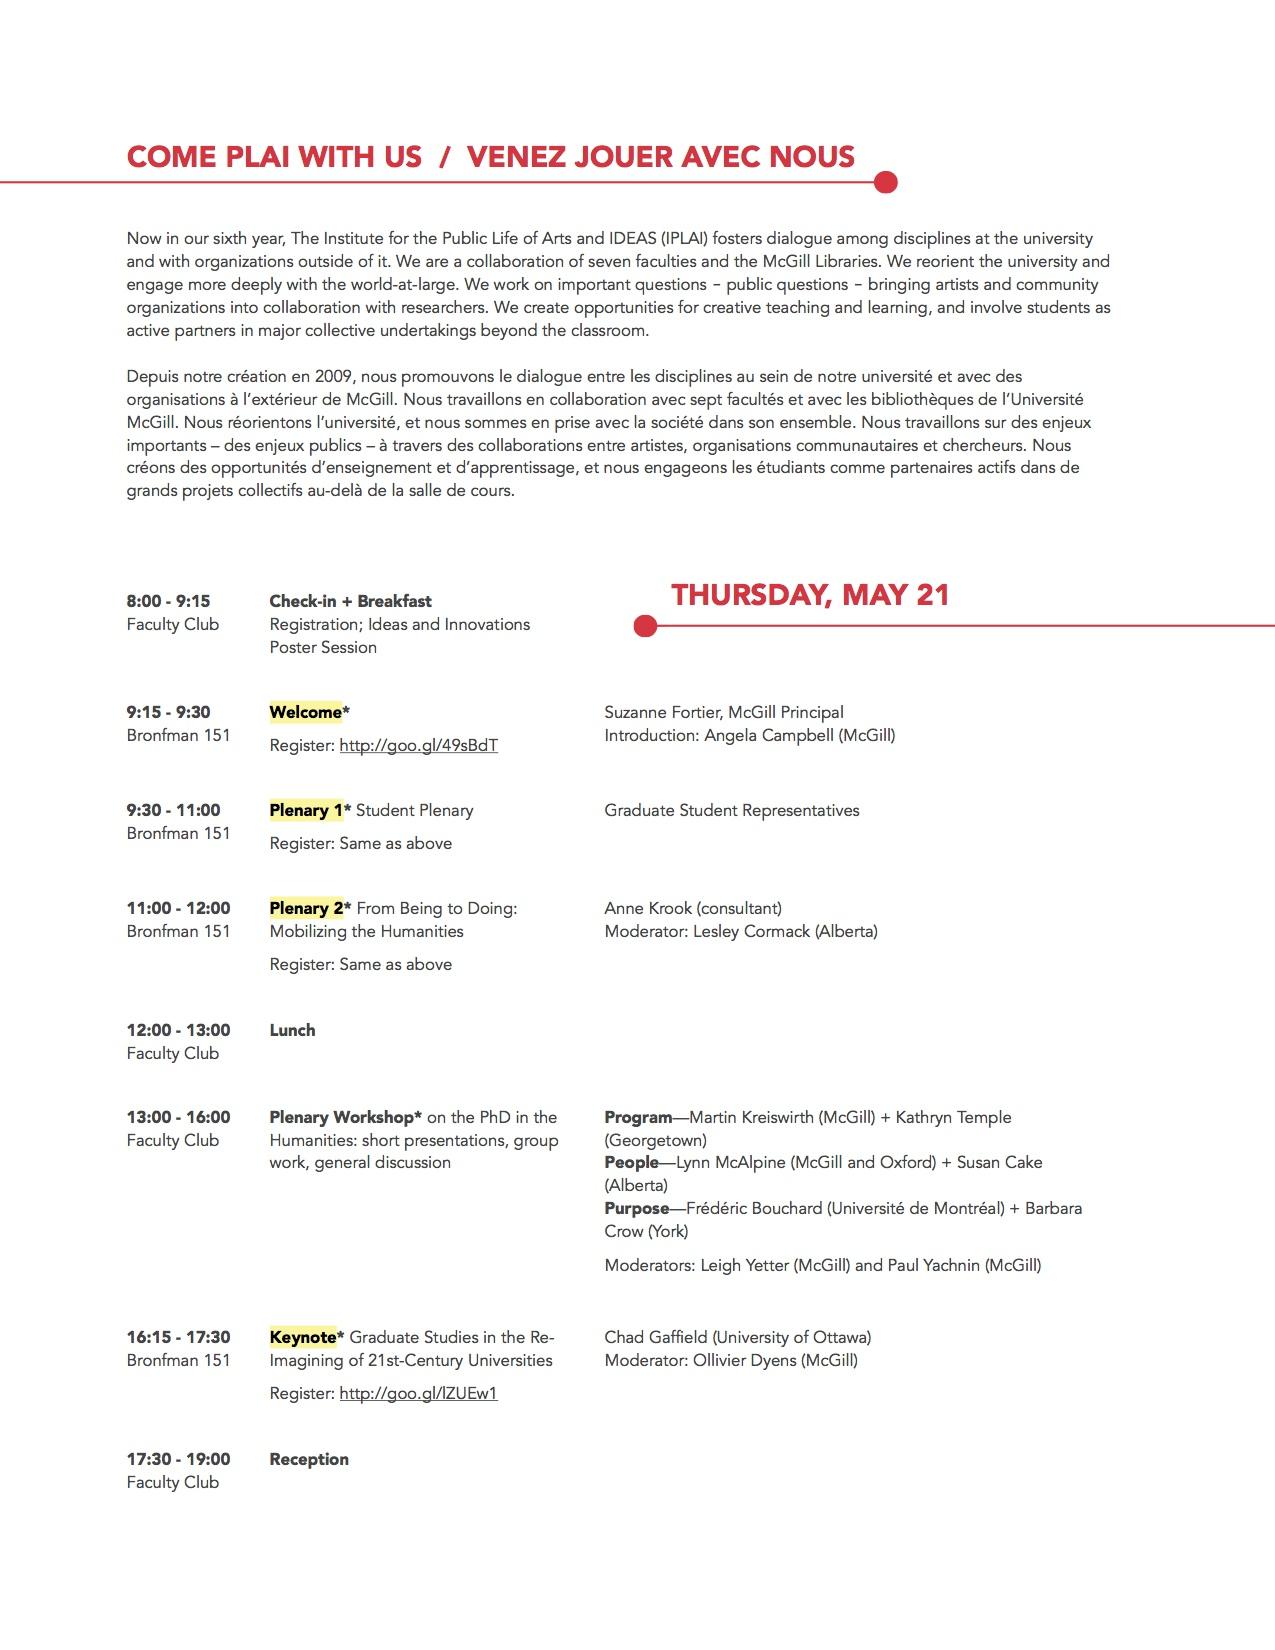 FH Conference Program FINAL 2.jpg